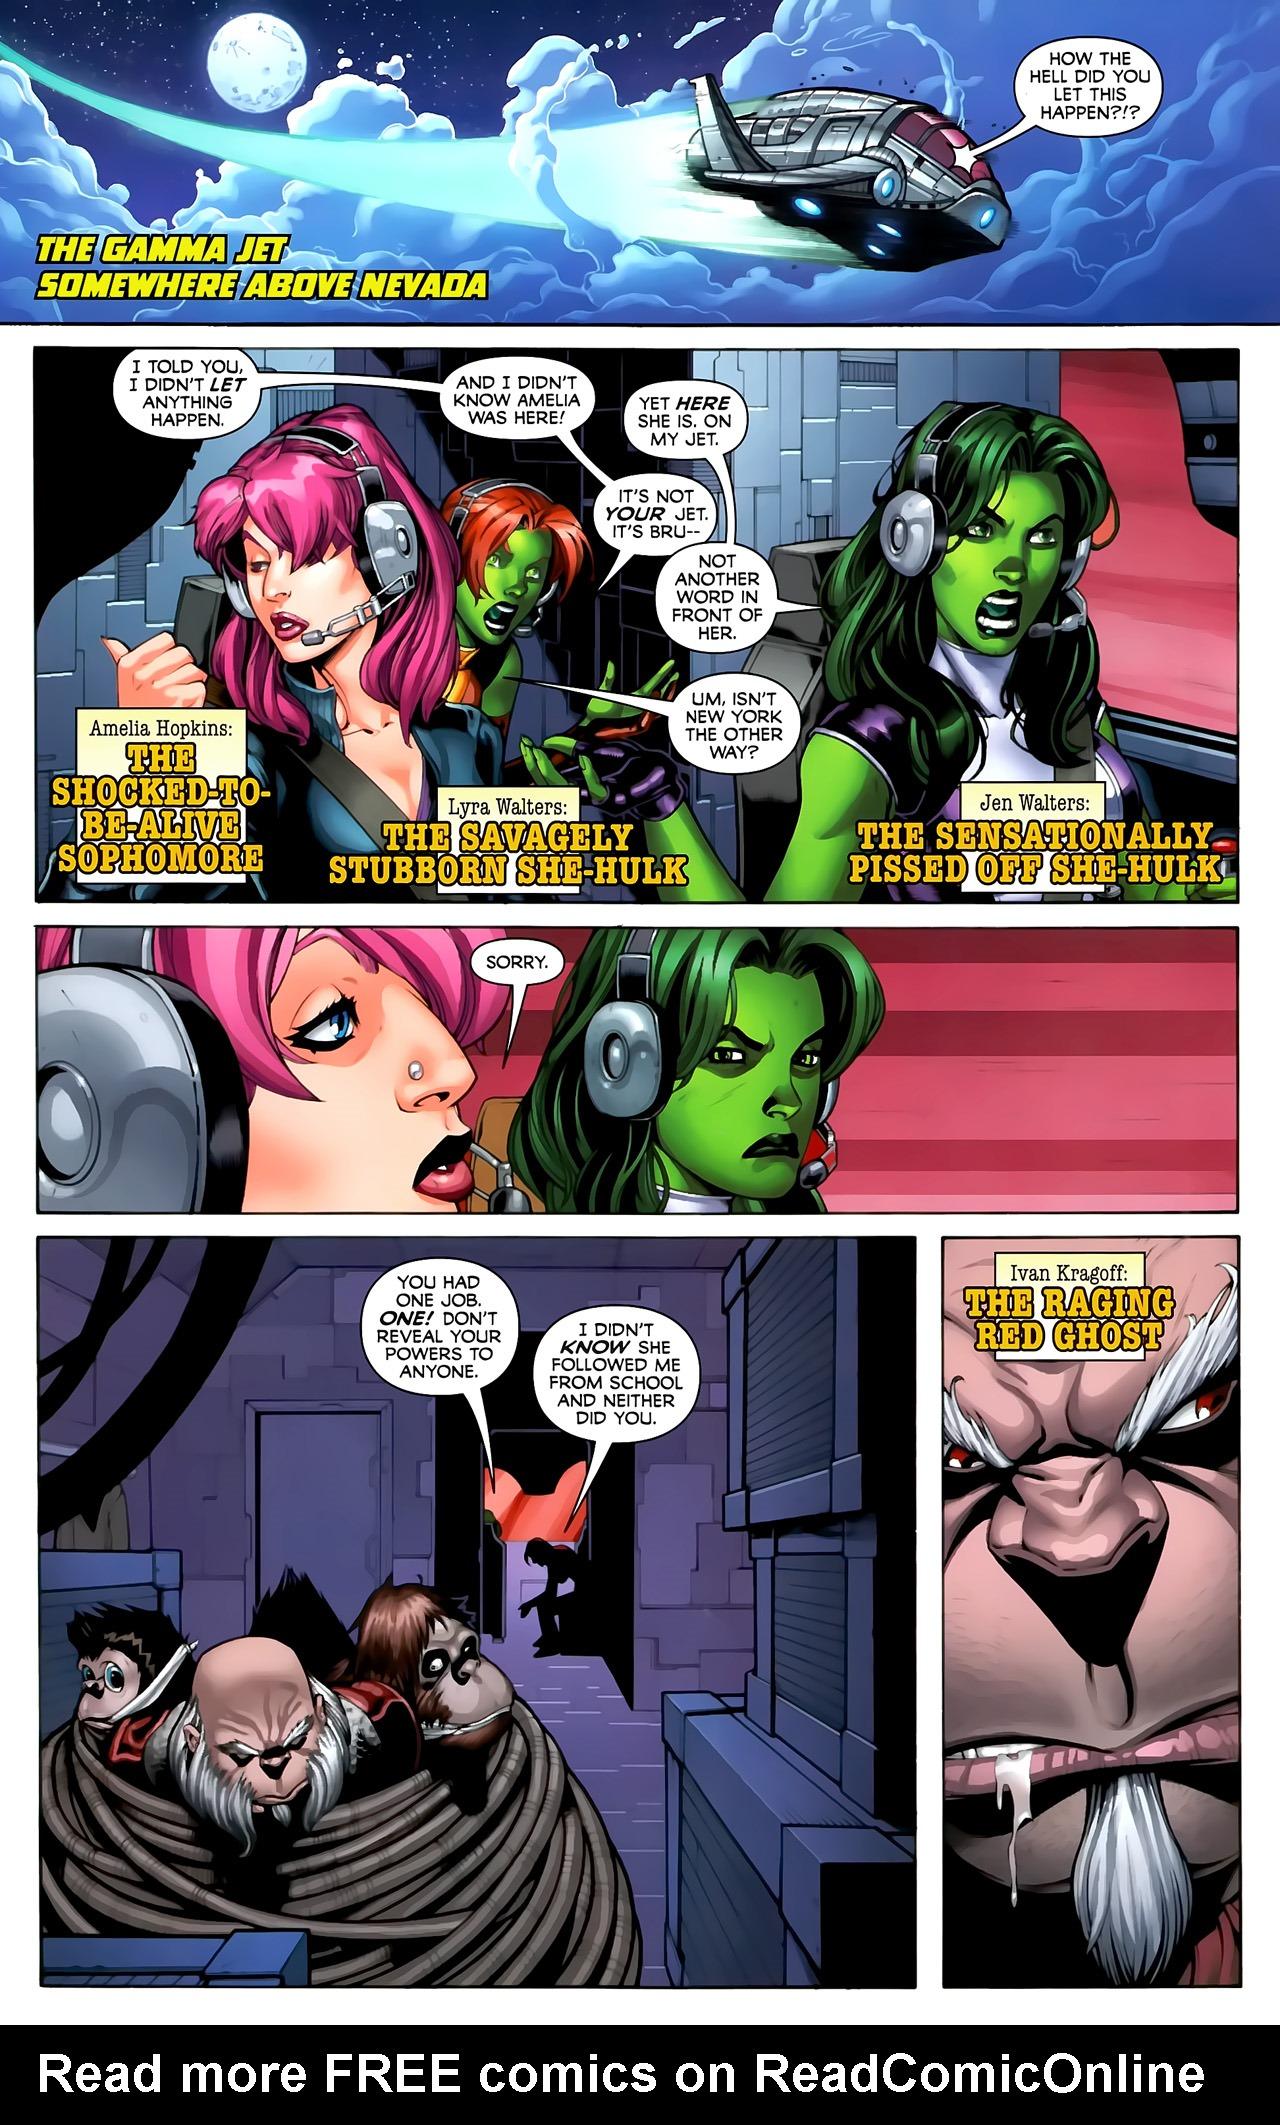 Read online She-Hulks comic -  Issue #3 - 3